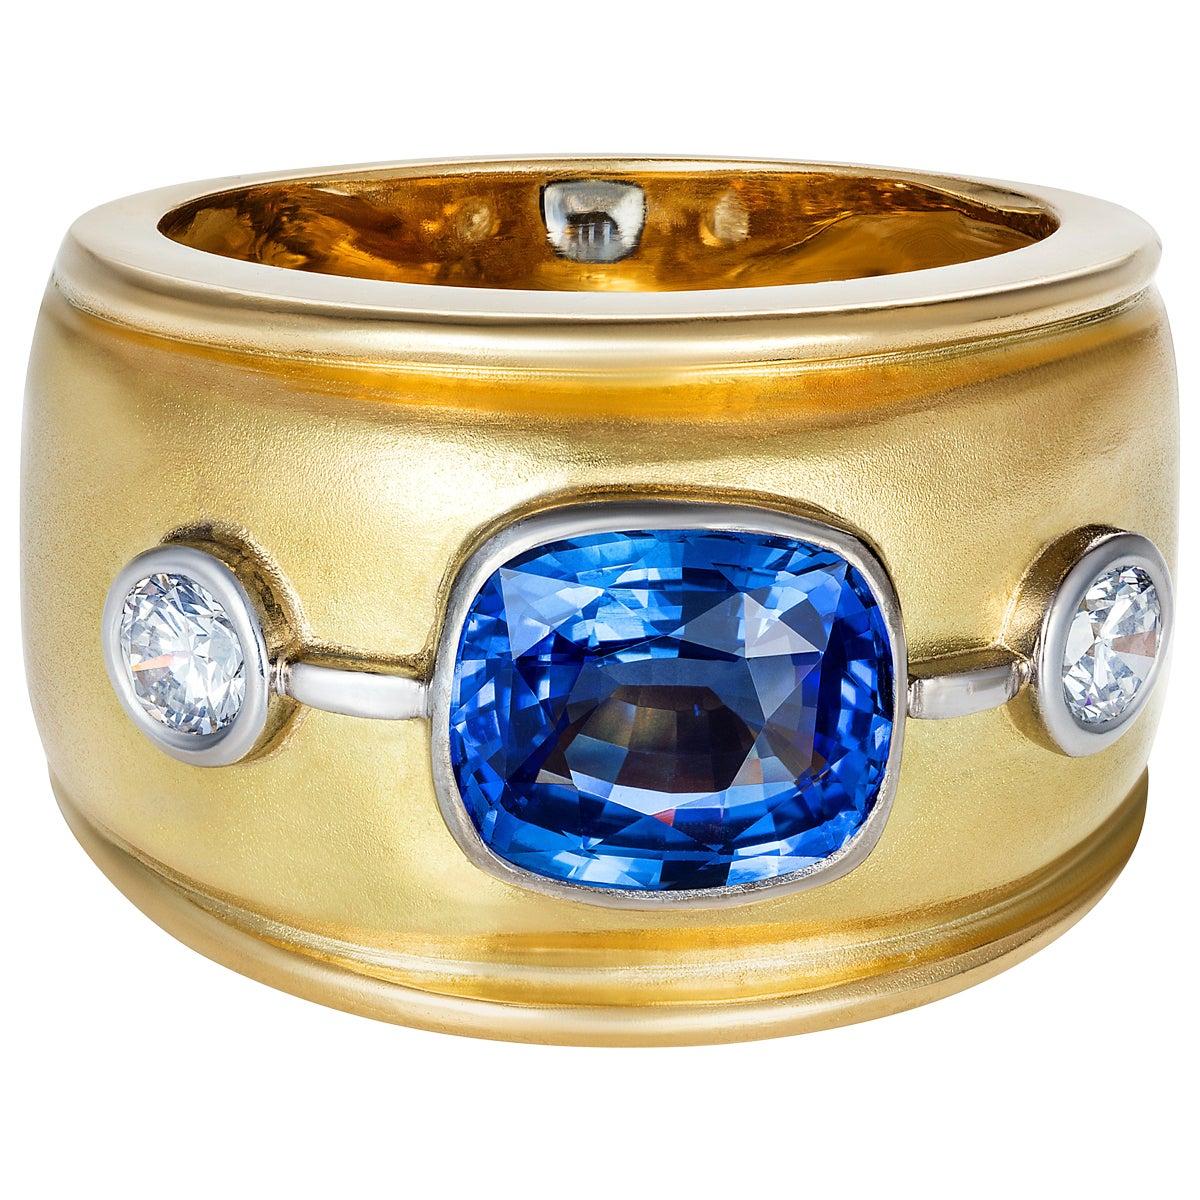 Sri Lankan Blue Sapphire and White Diamonds Cocktail Ring